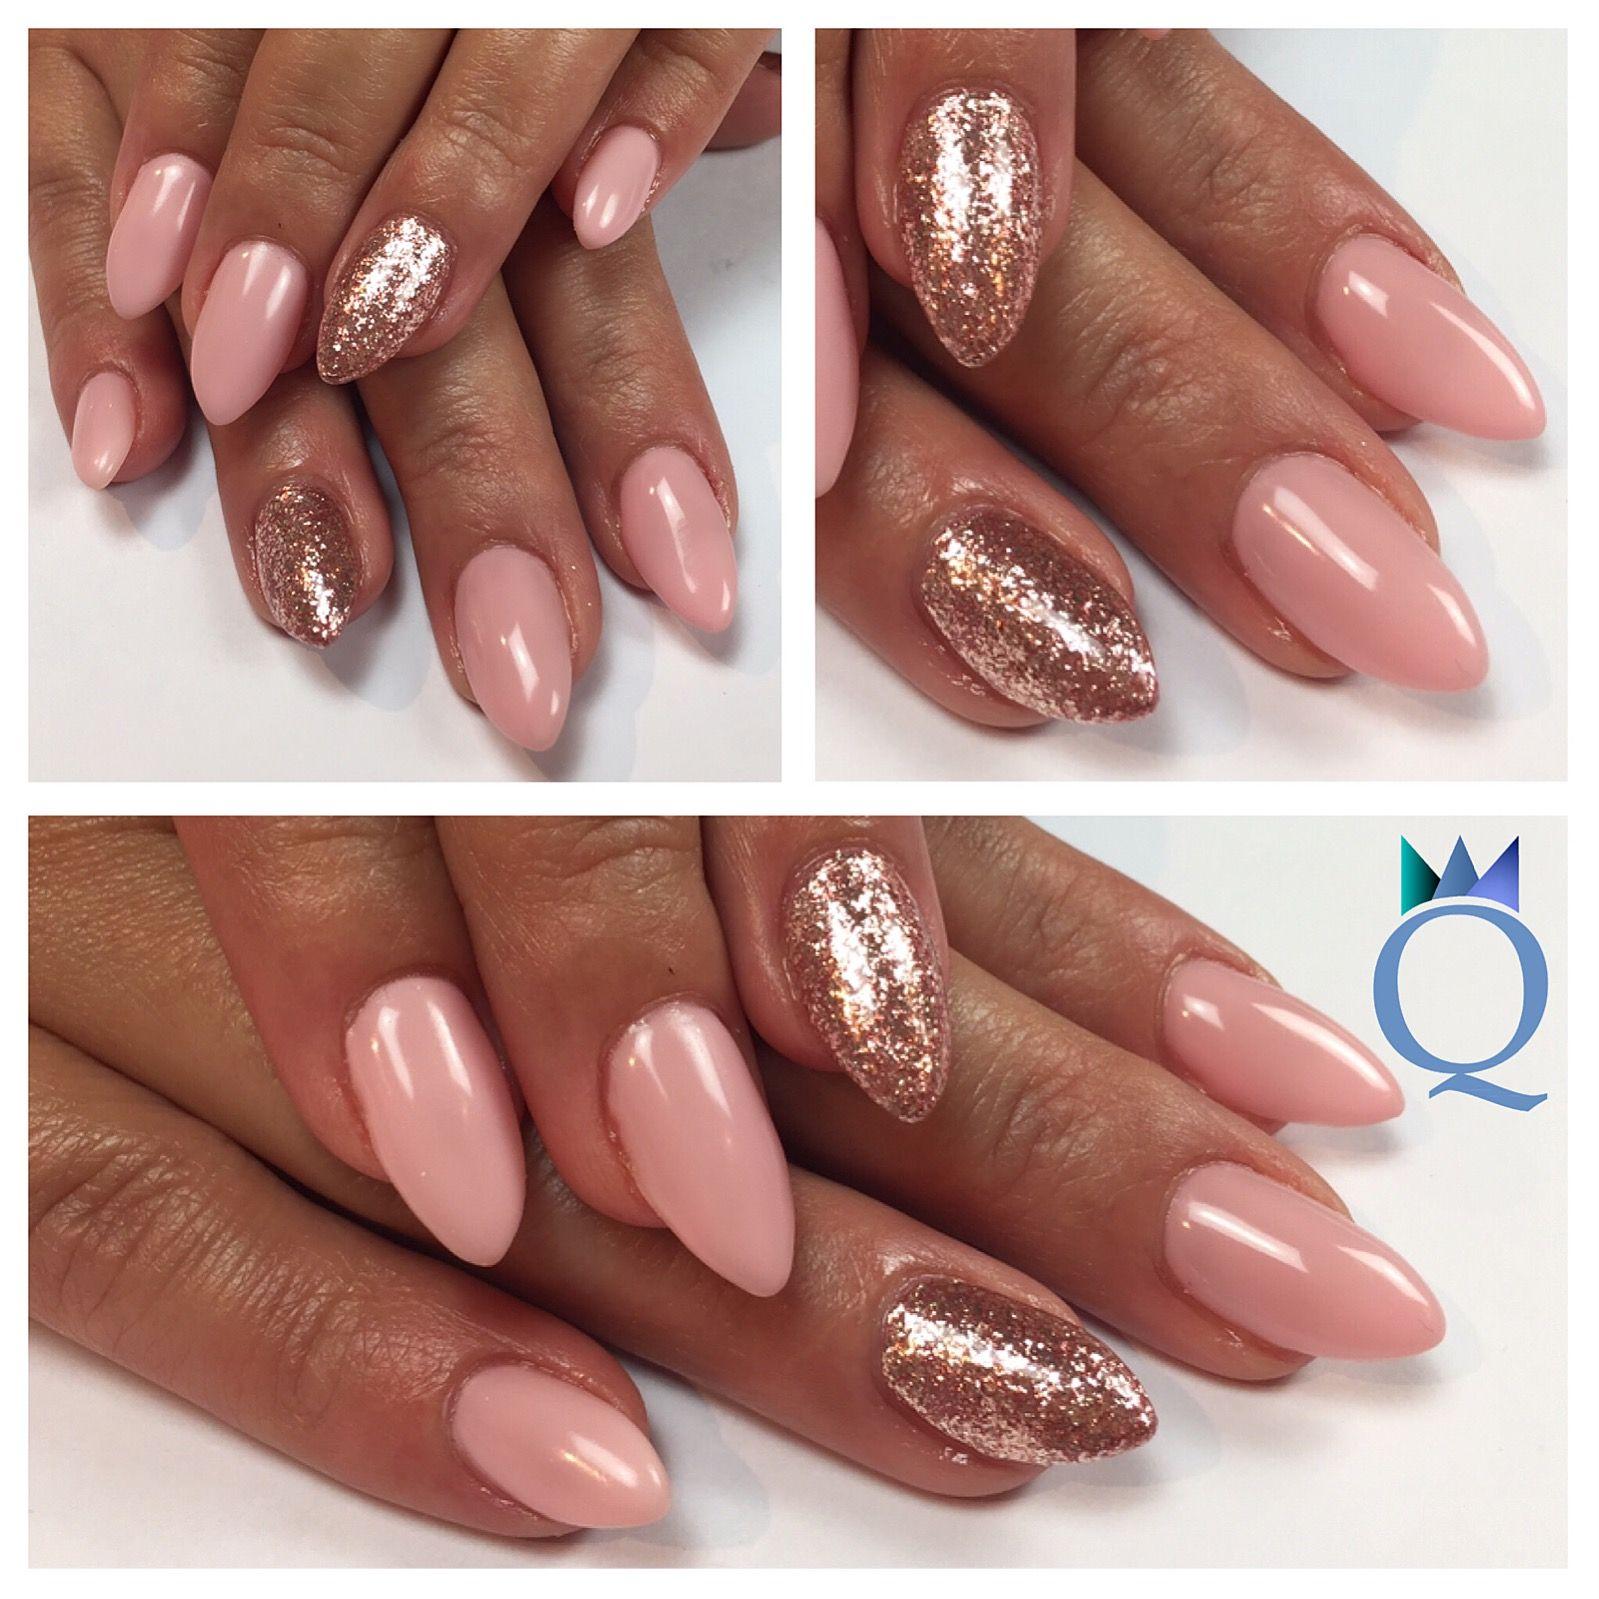 almondnails #gelnails #nails #rose #rosegoldleaf #akzéntz ...